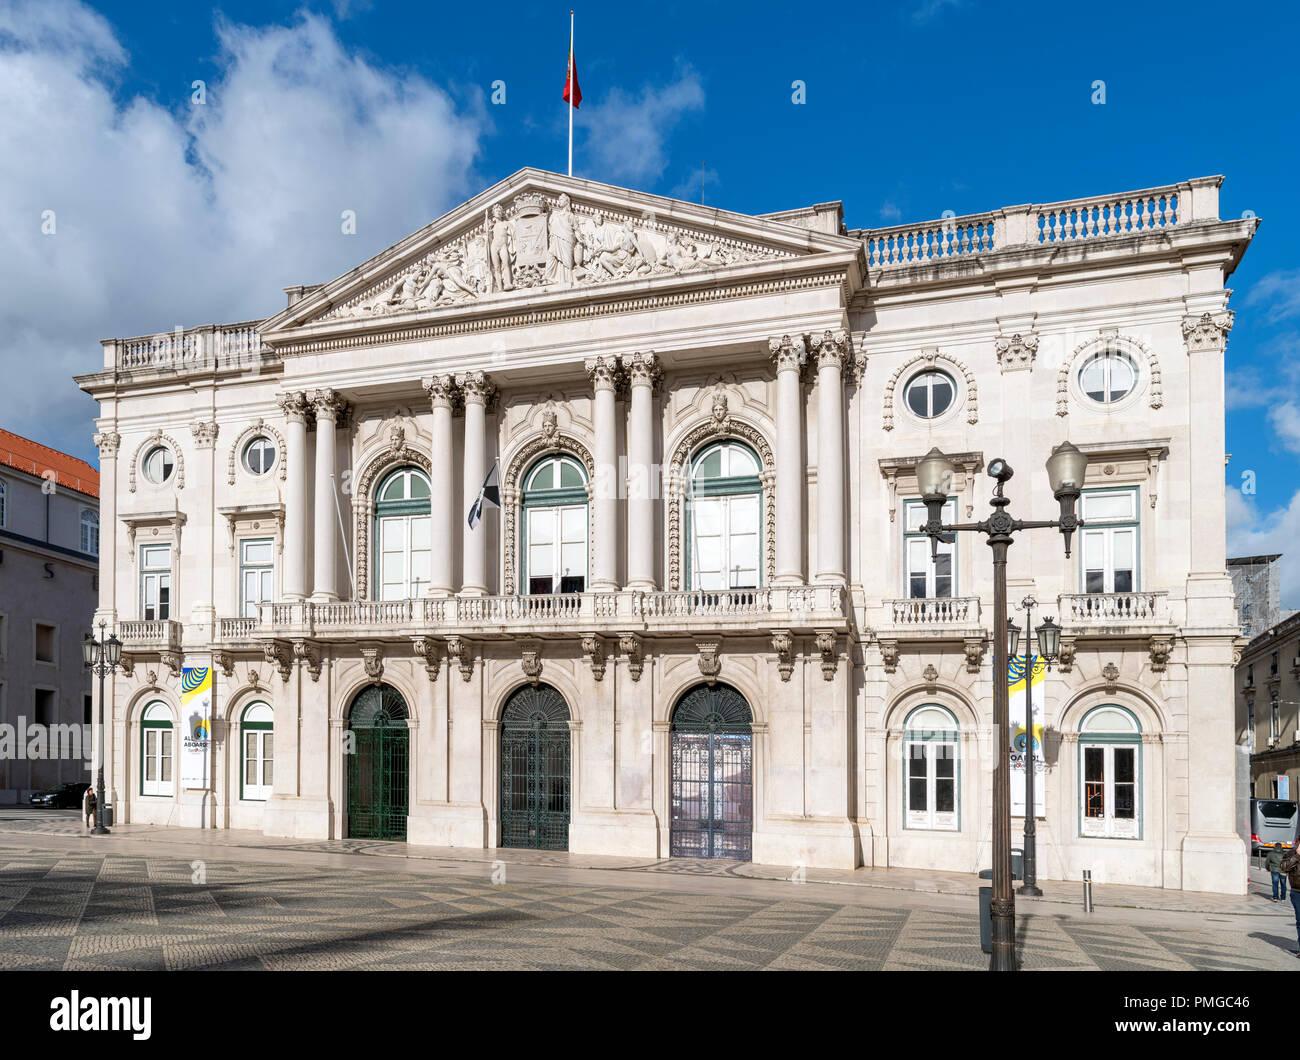 Lisbon Town Hall (Camara Municipal de Lisboa), Praca do Municipio, Lisbon, Portugal - Stock Image